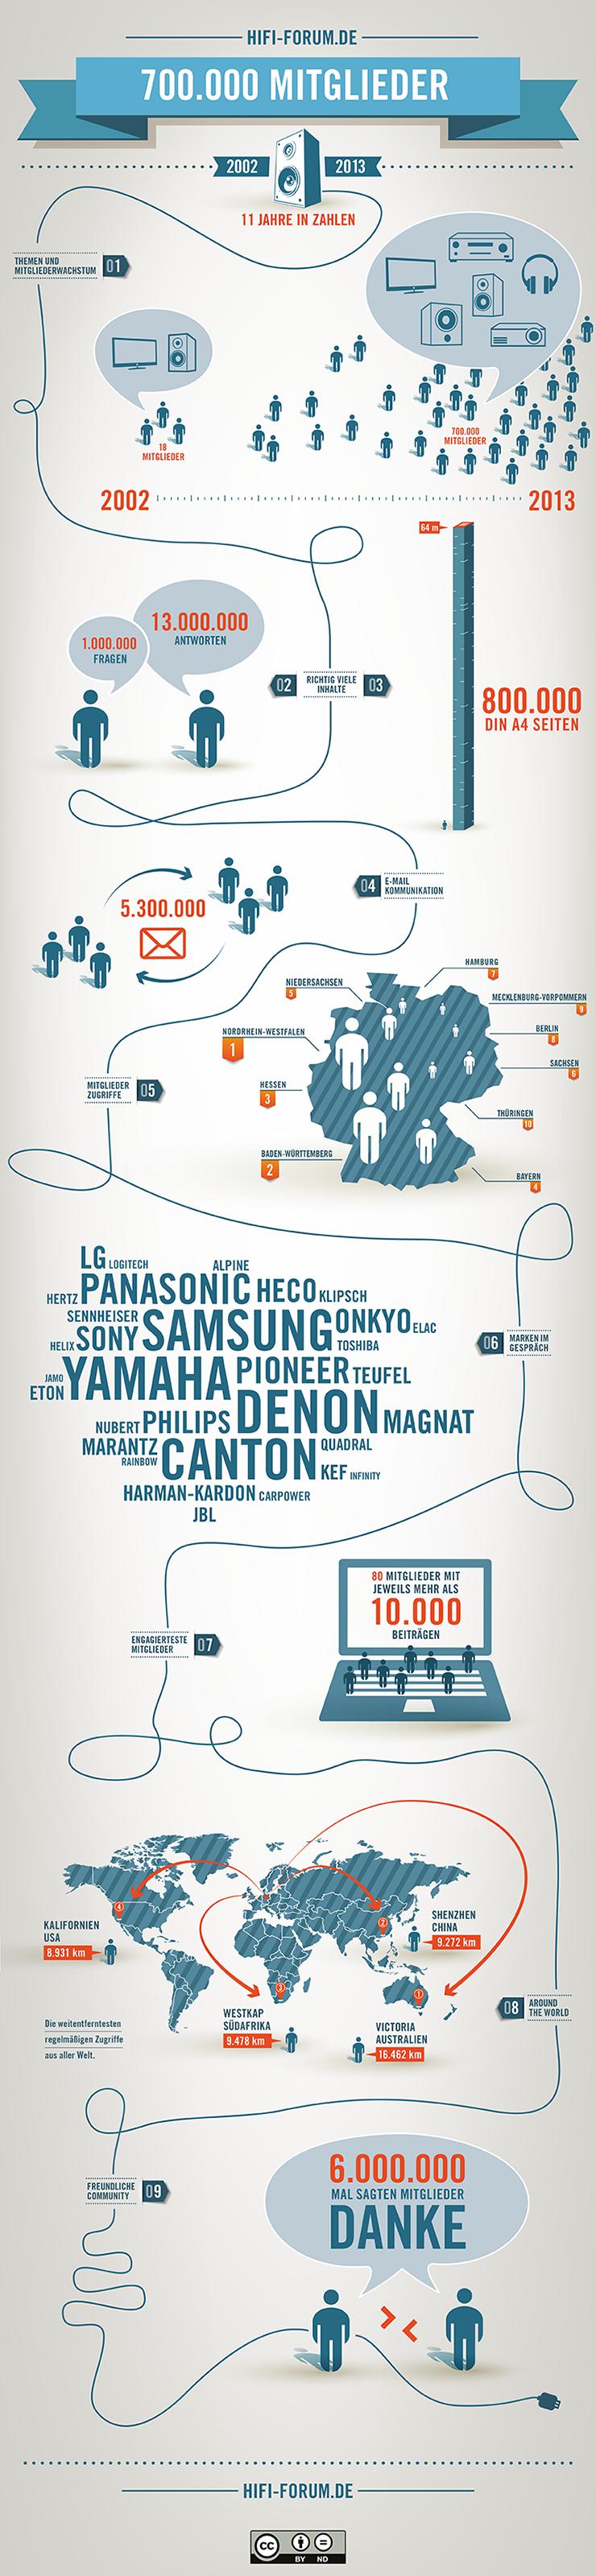 HiFi-Forum 700.000 Mitglieder Infografik